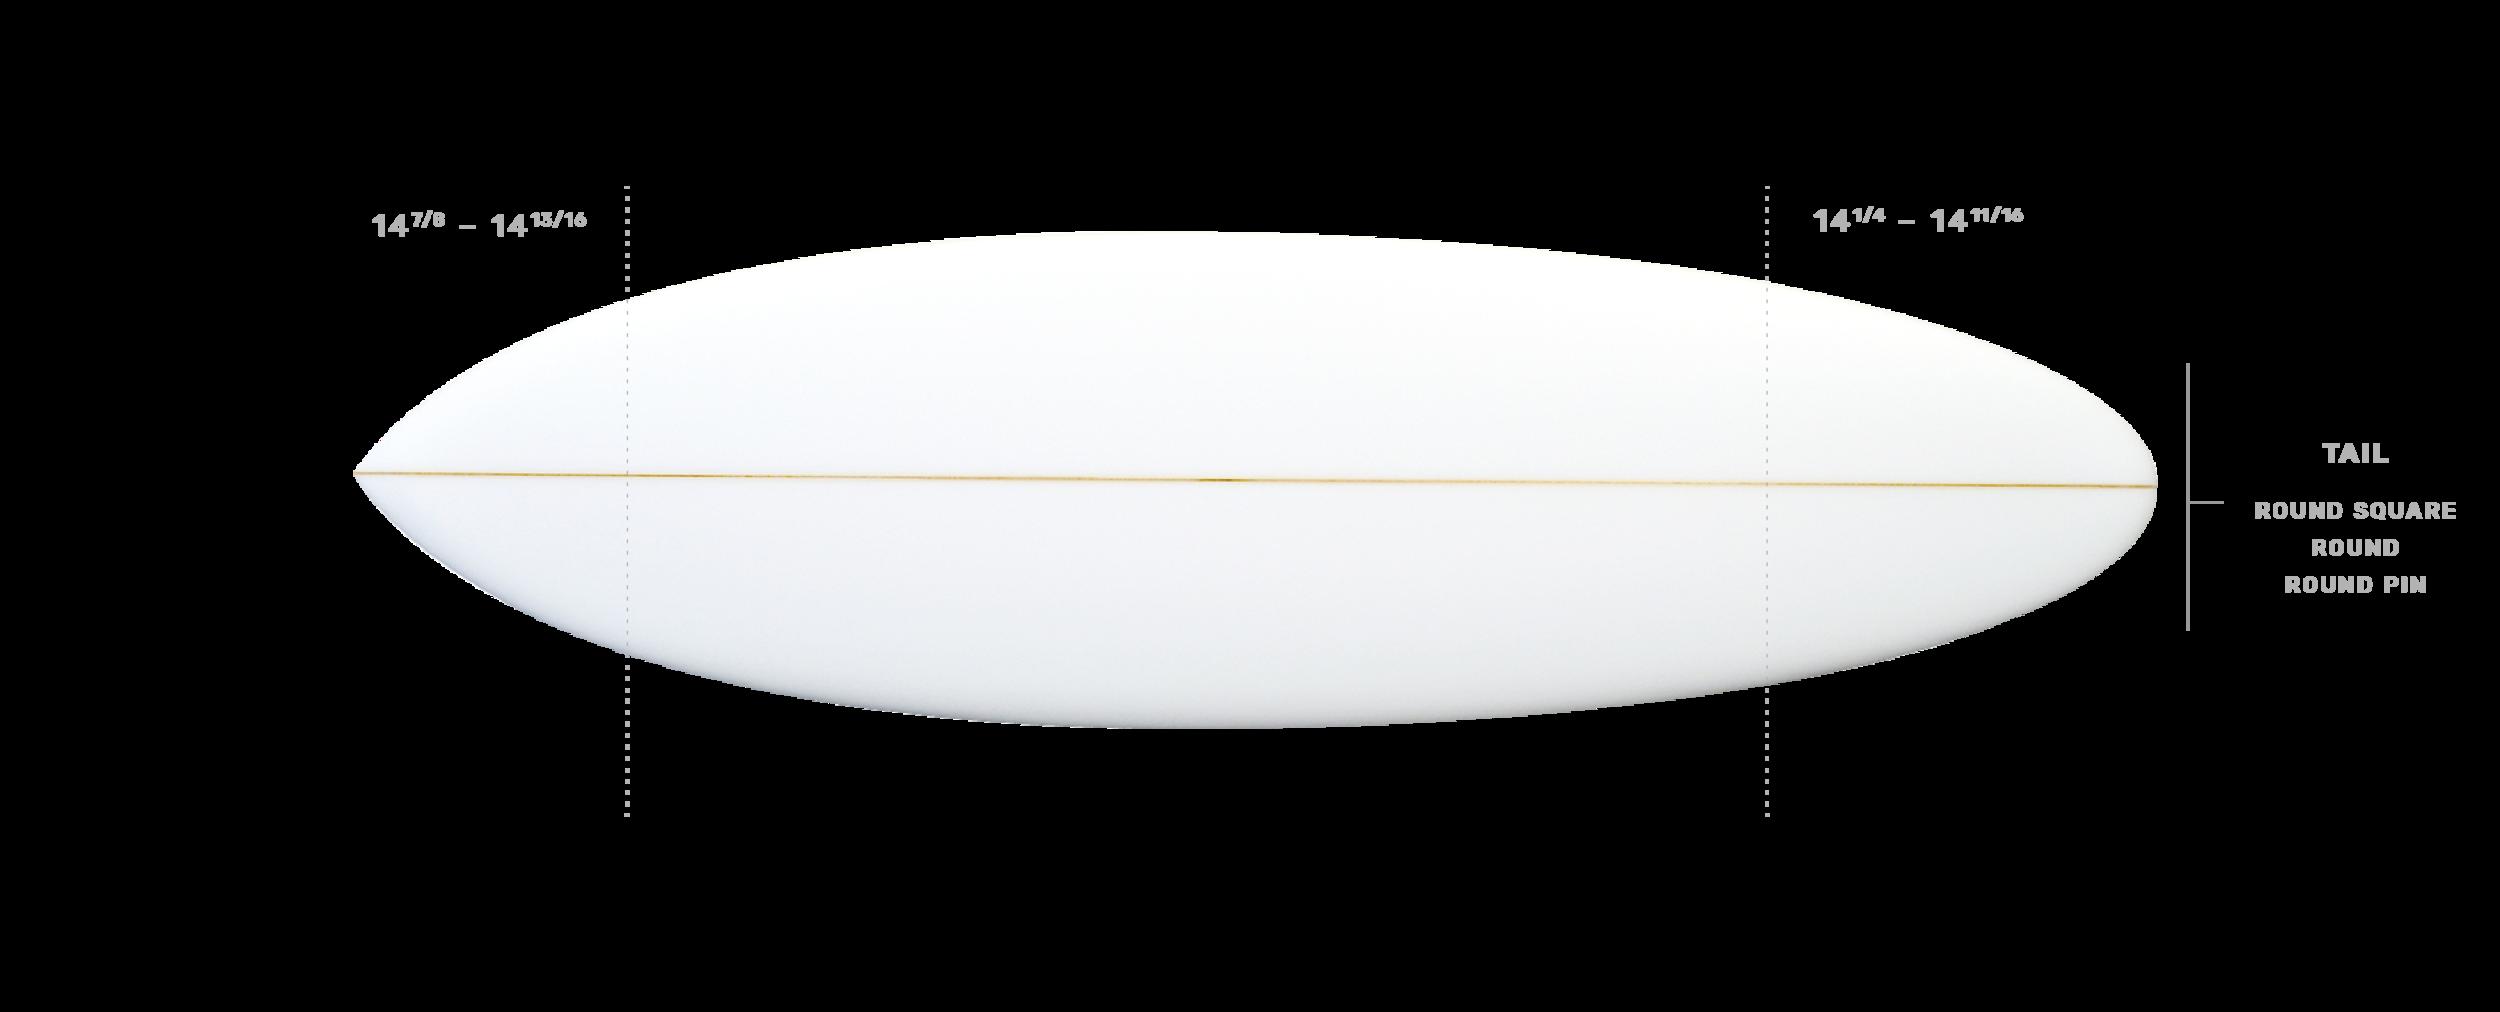 Takeda-custom-board-specs-RETRO-MODELS-leaf-deck.png